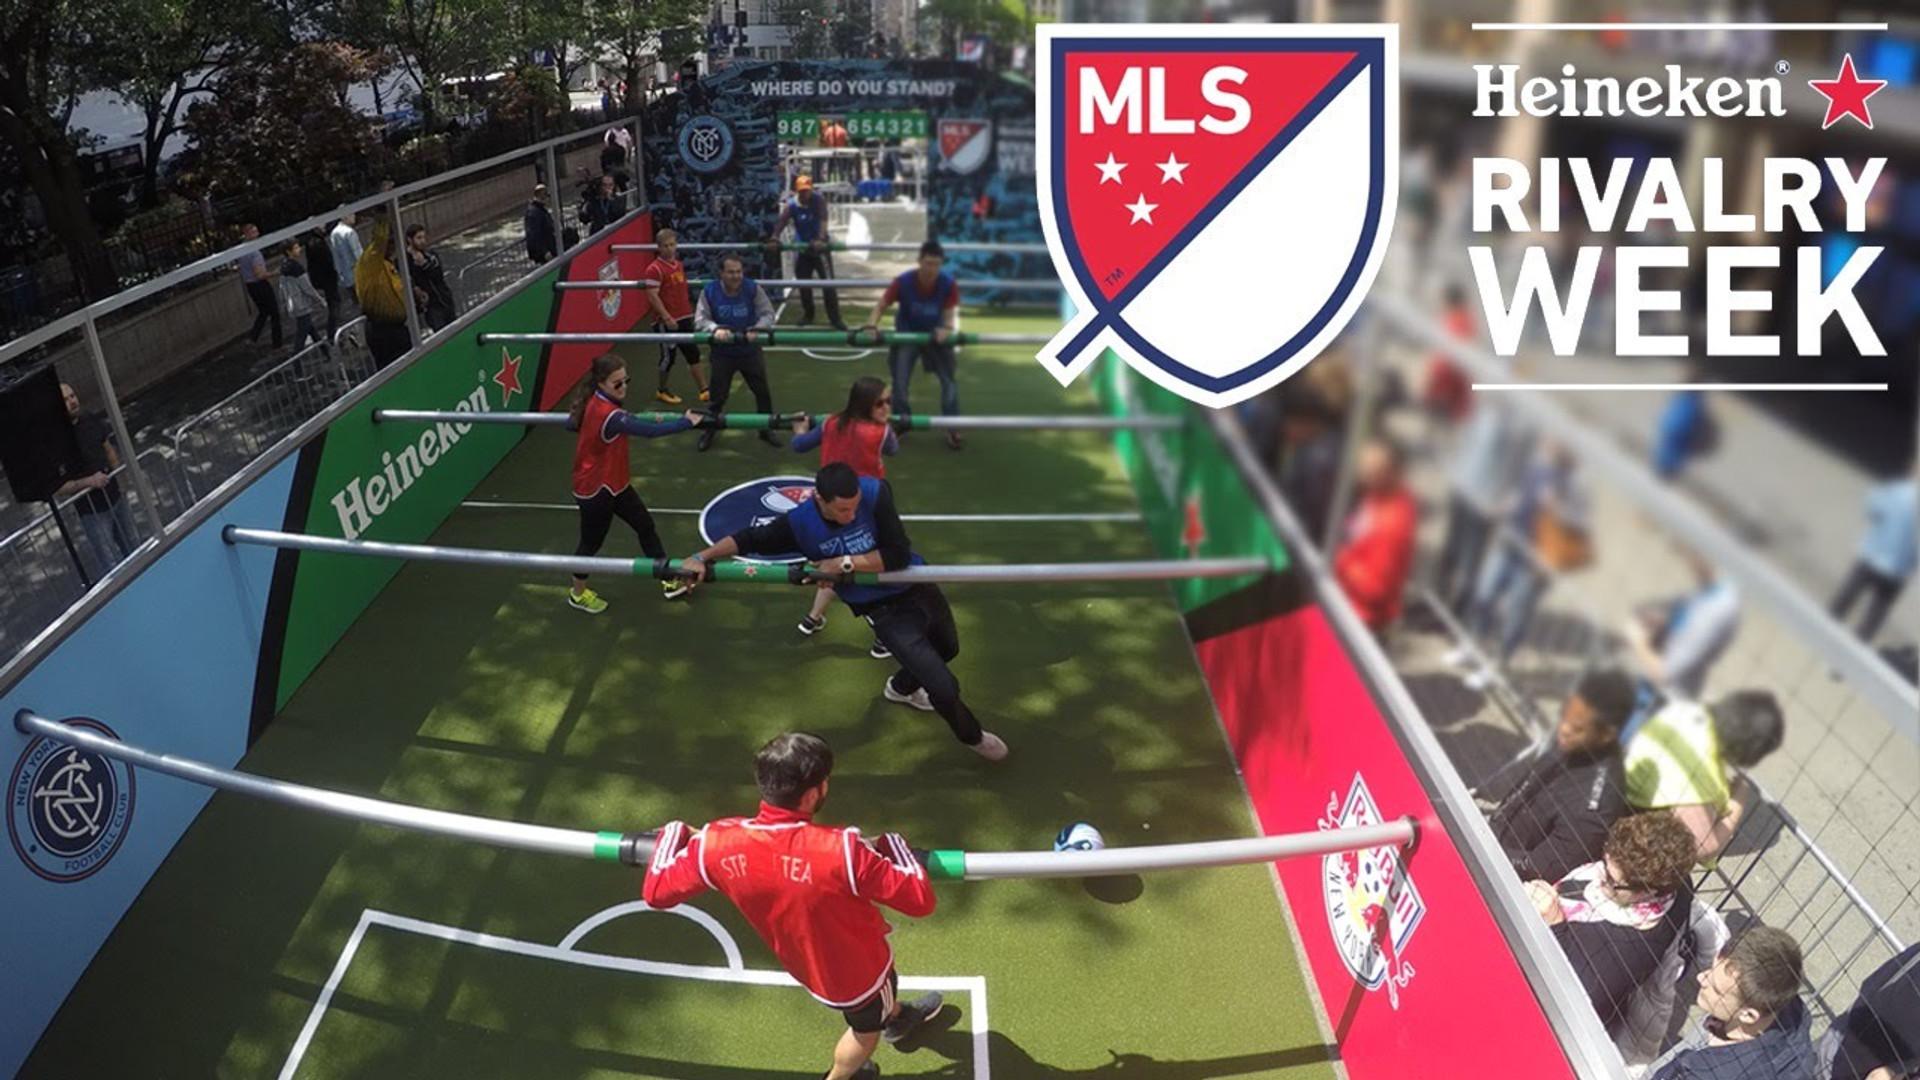 MLS Heineken Rivalry Week